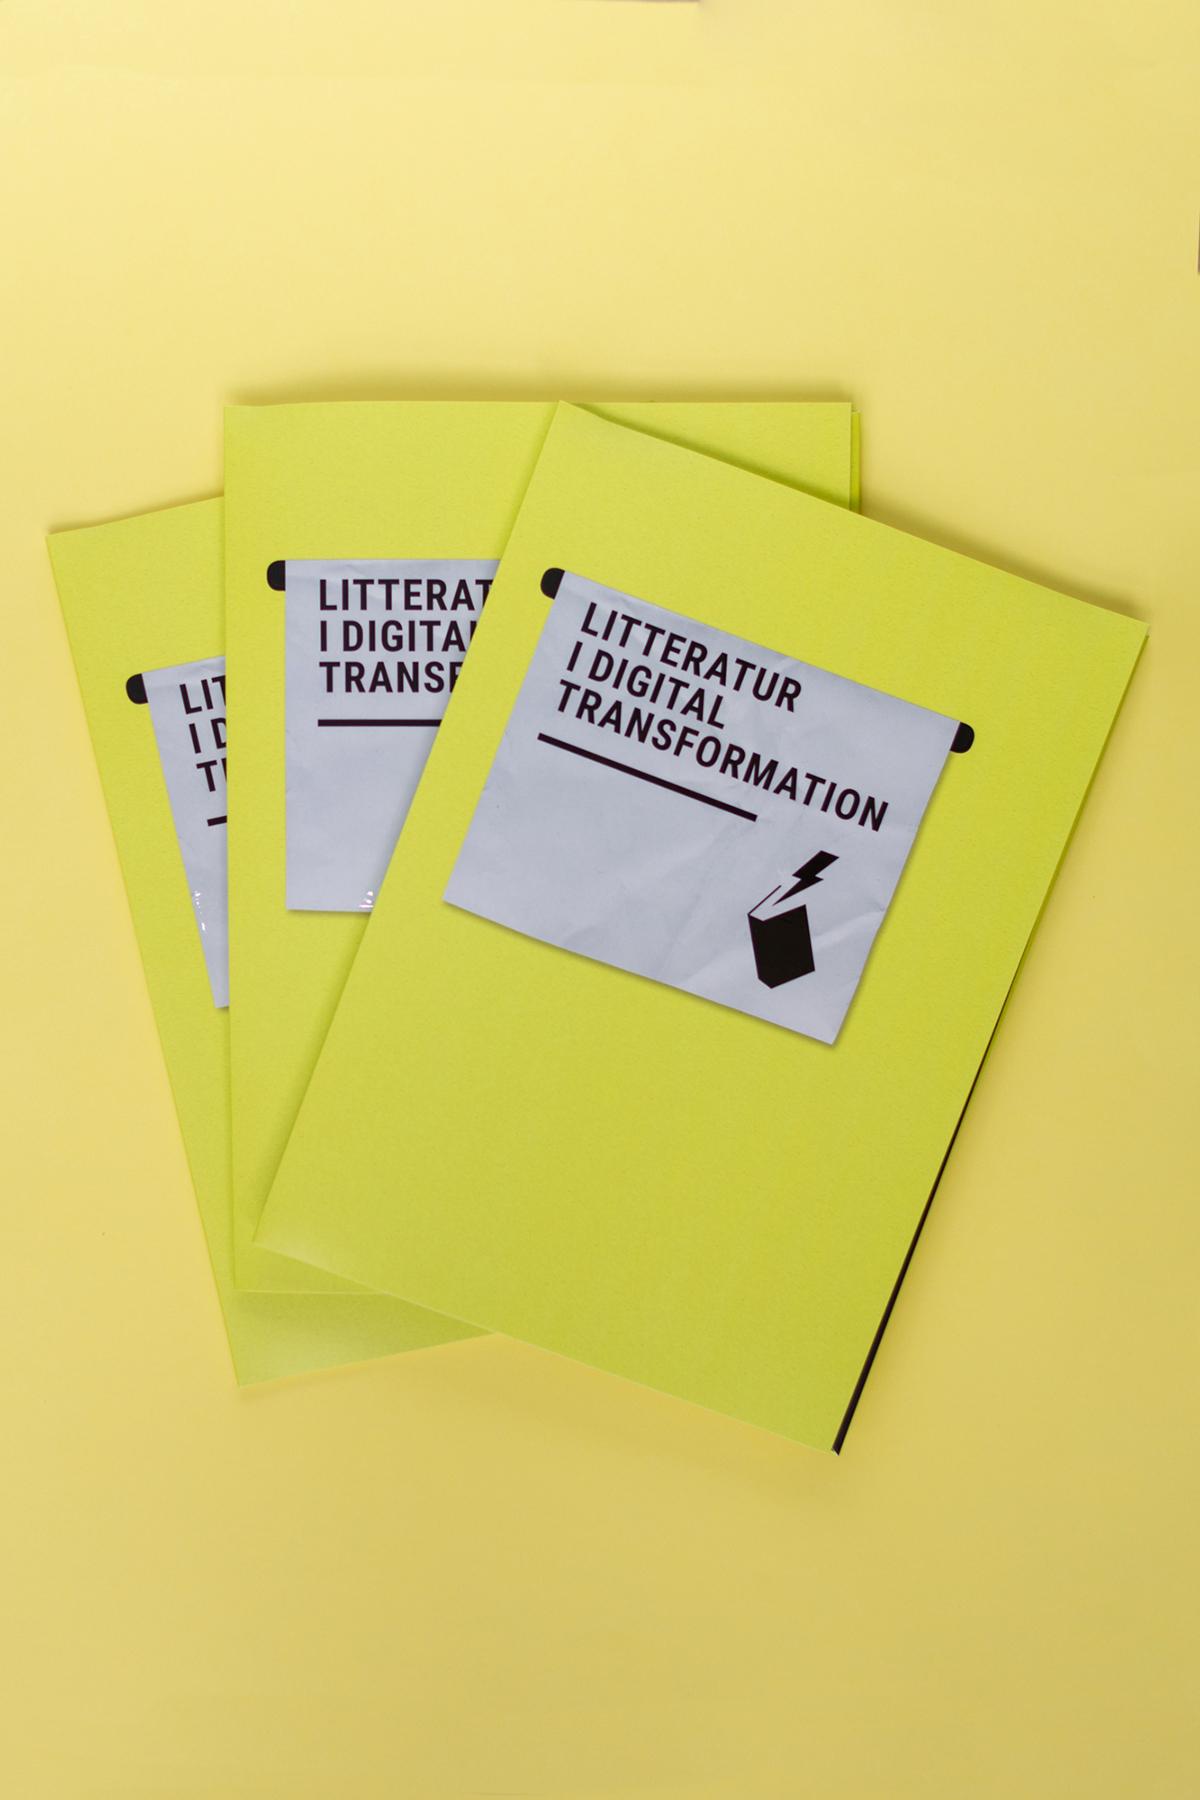 litteratur-digital-transformation-design-malene-hald-2